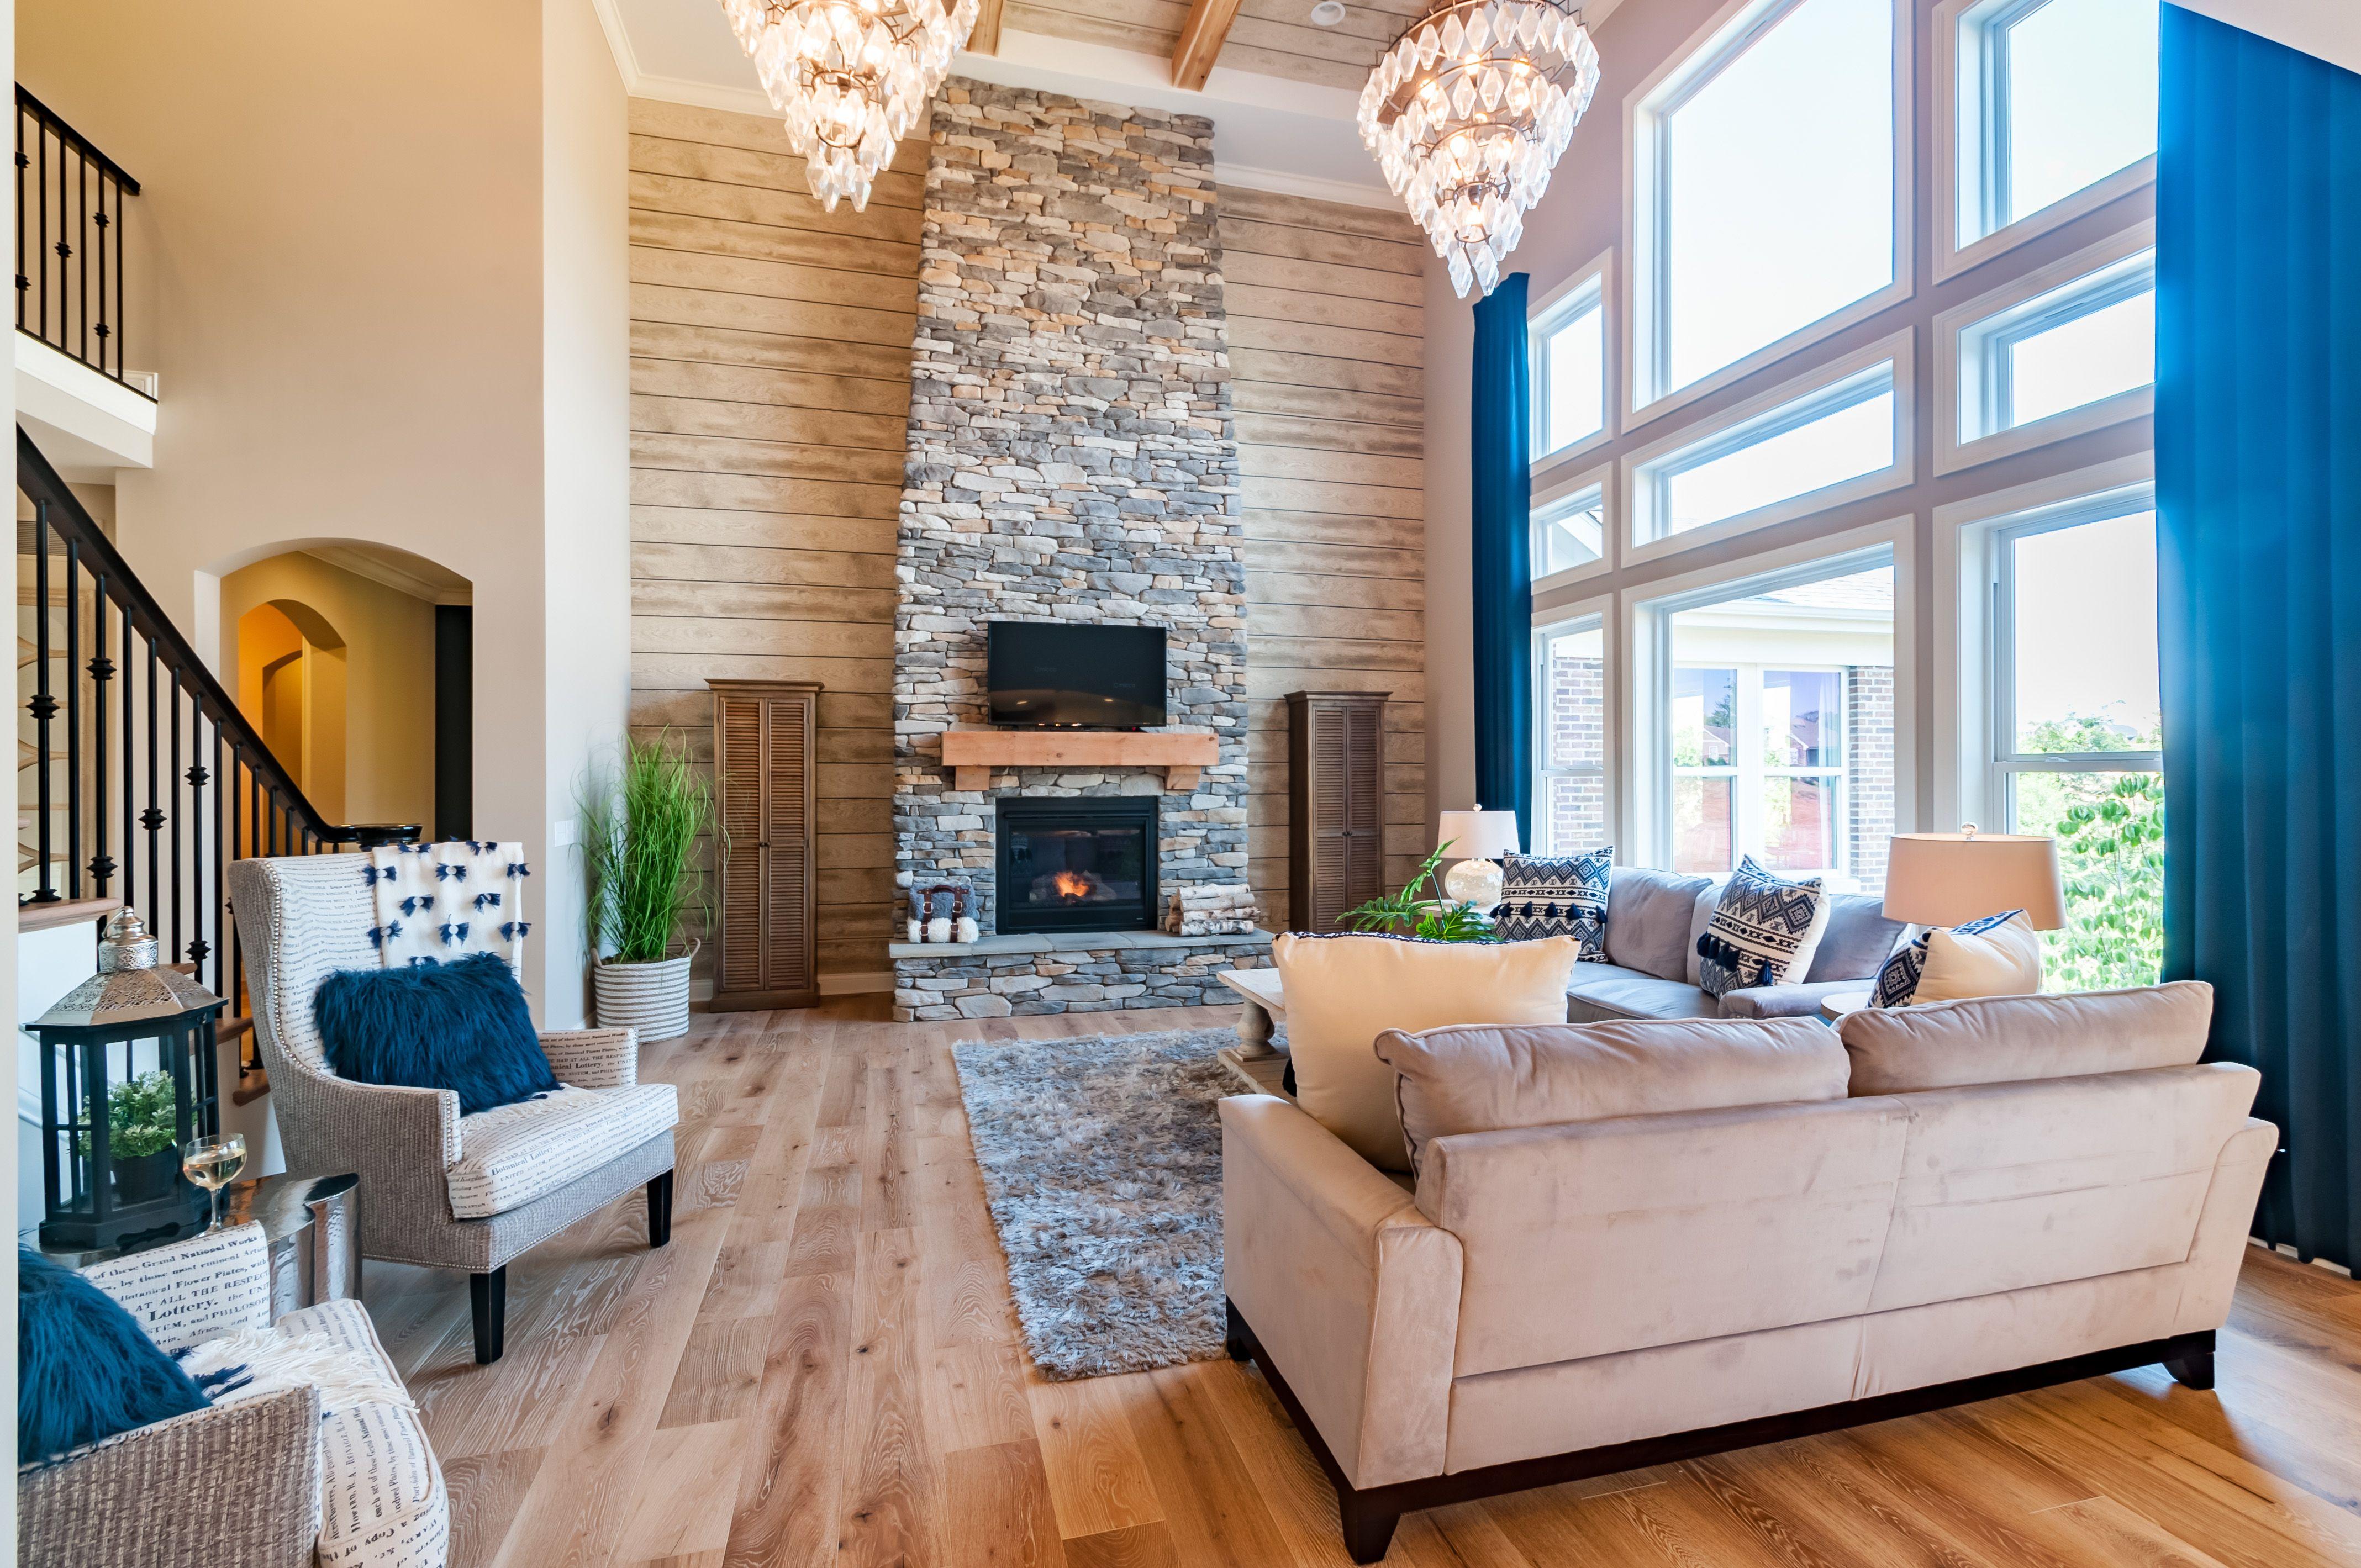 New Homes In Carmel 273 Communities Newhomesource Home Theaters And Hidden Tvs Westmount Builders Custom Luxury